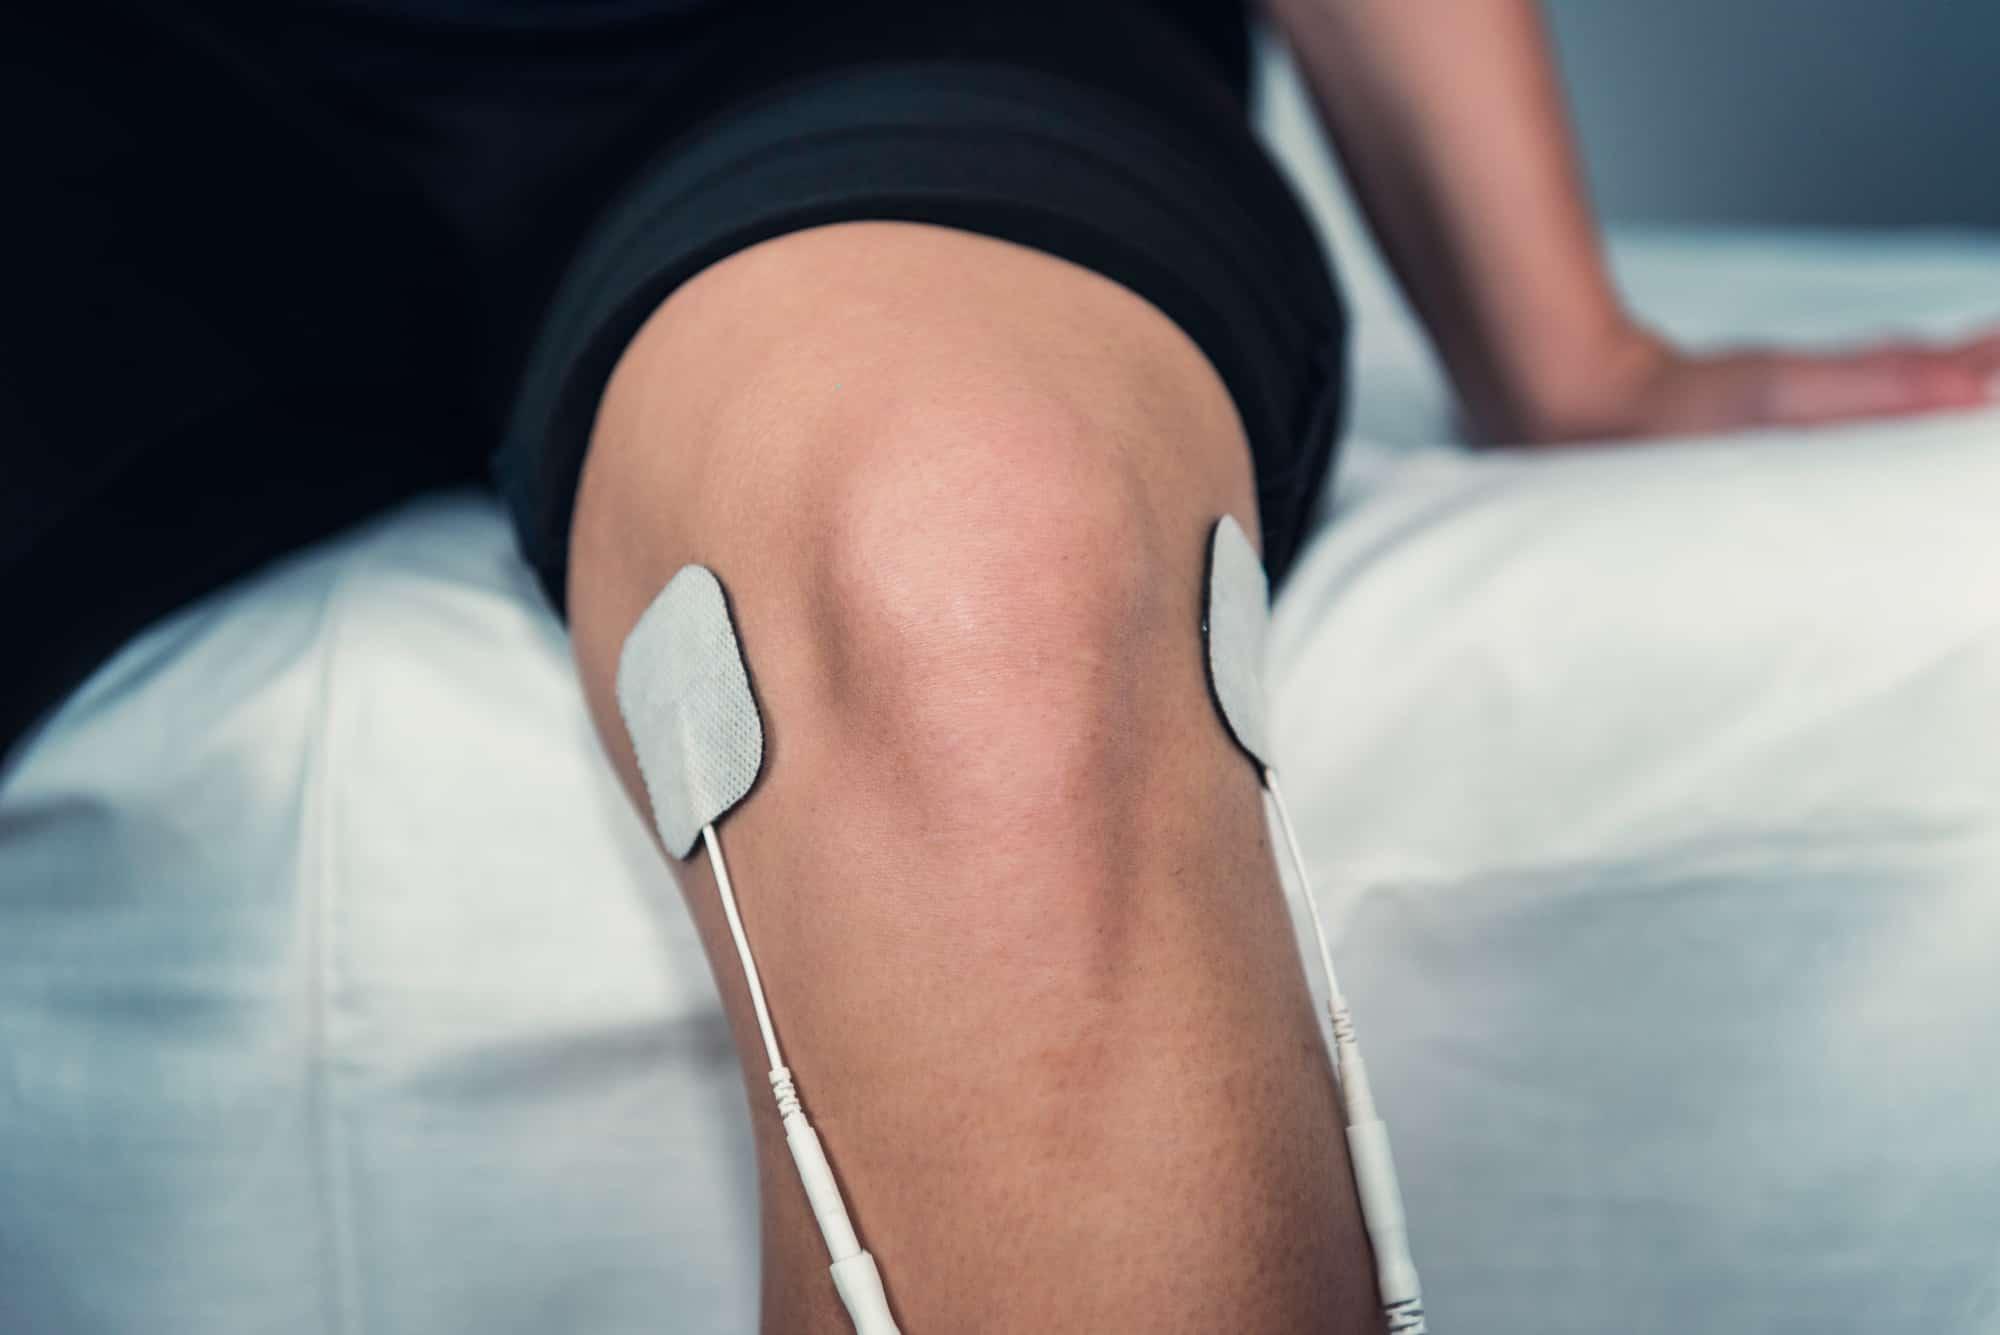 receiving TENS treatment on knee